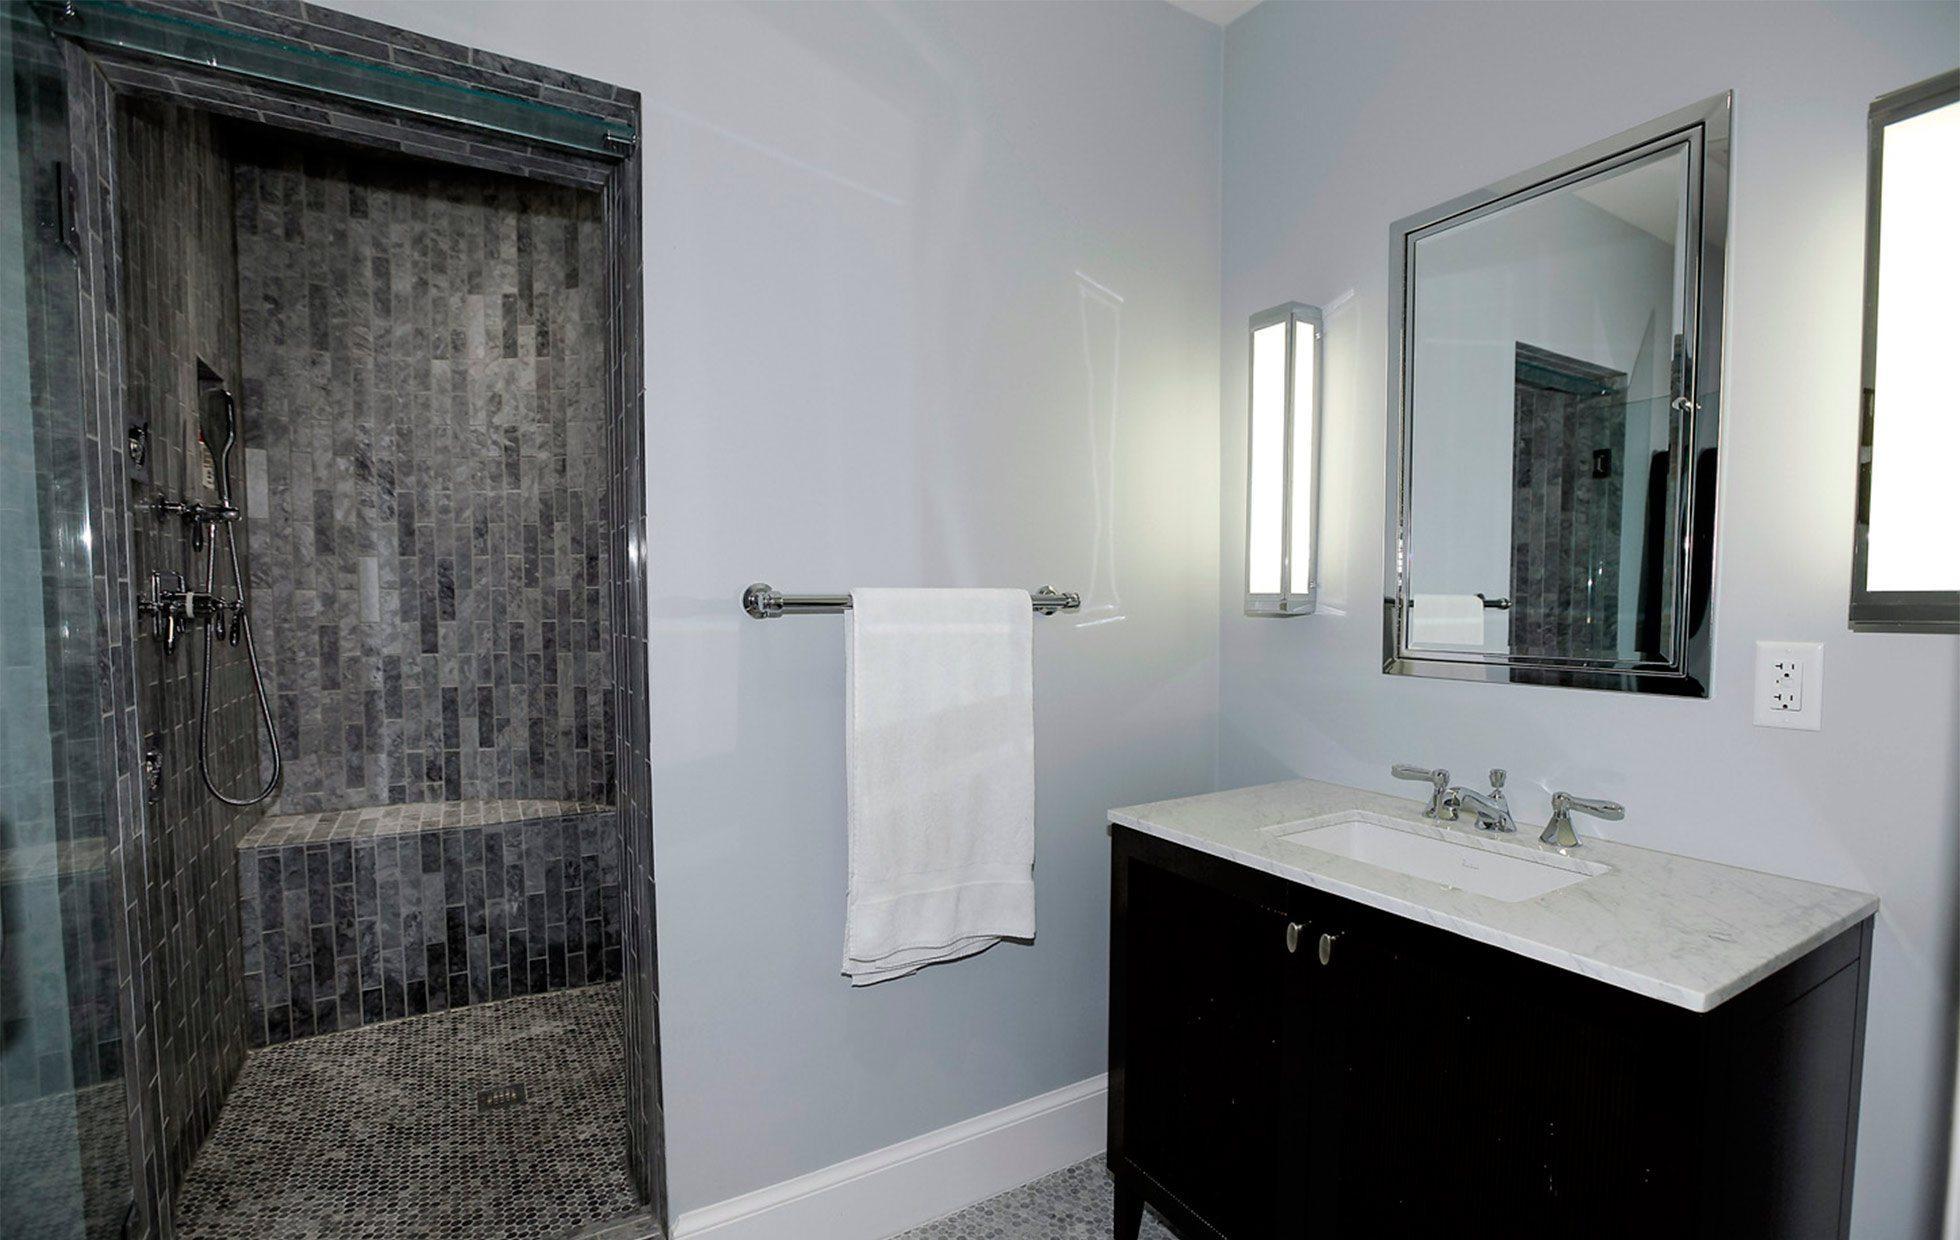 58820006e2d0a2446-Belmont-Road-NW-Washington-DC-Obamas-New-Home-His-Bath